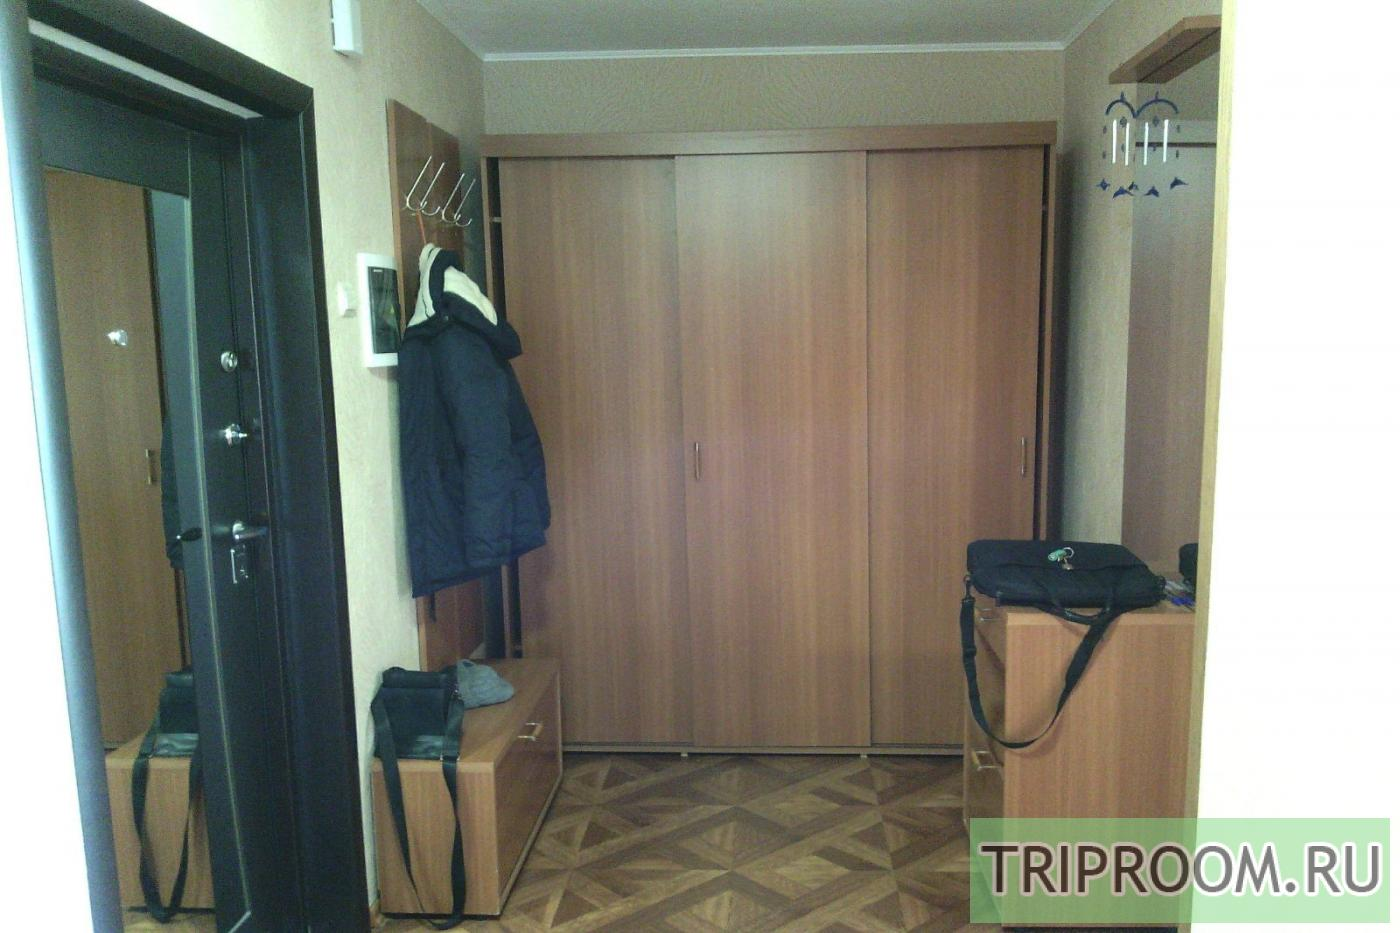 2-комнатная квартира посуточно (вариант № 33661), ул. Морозова Павла Леонтьевича, фото № 4